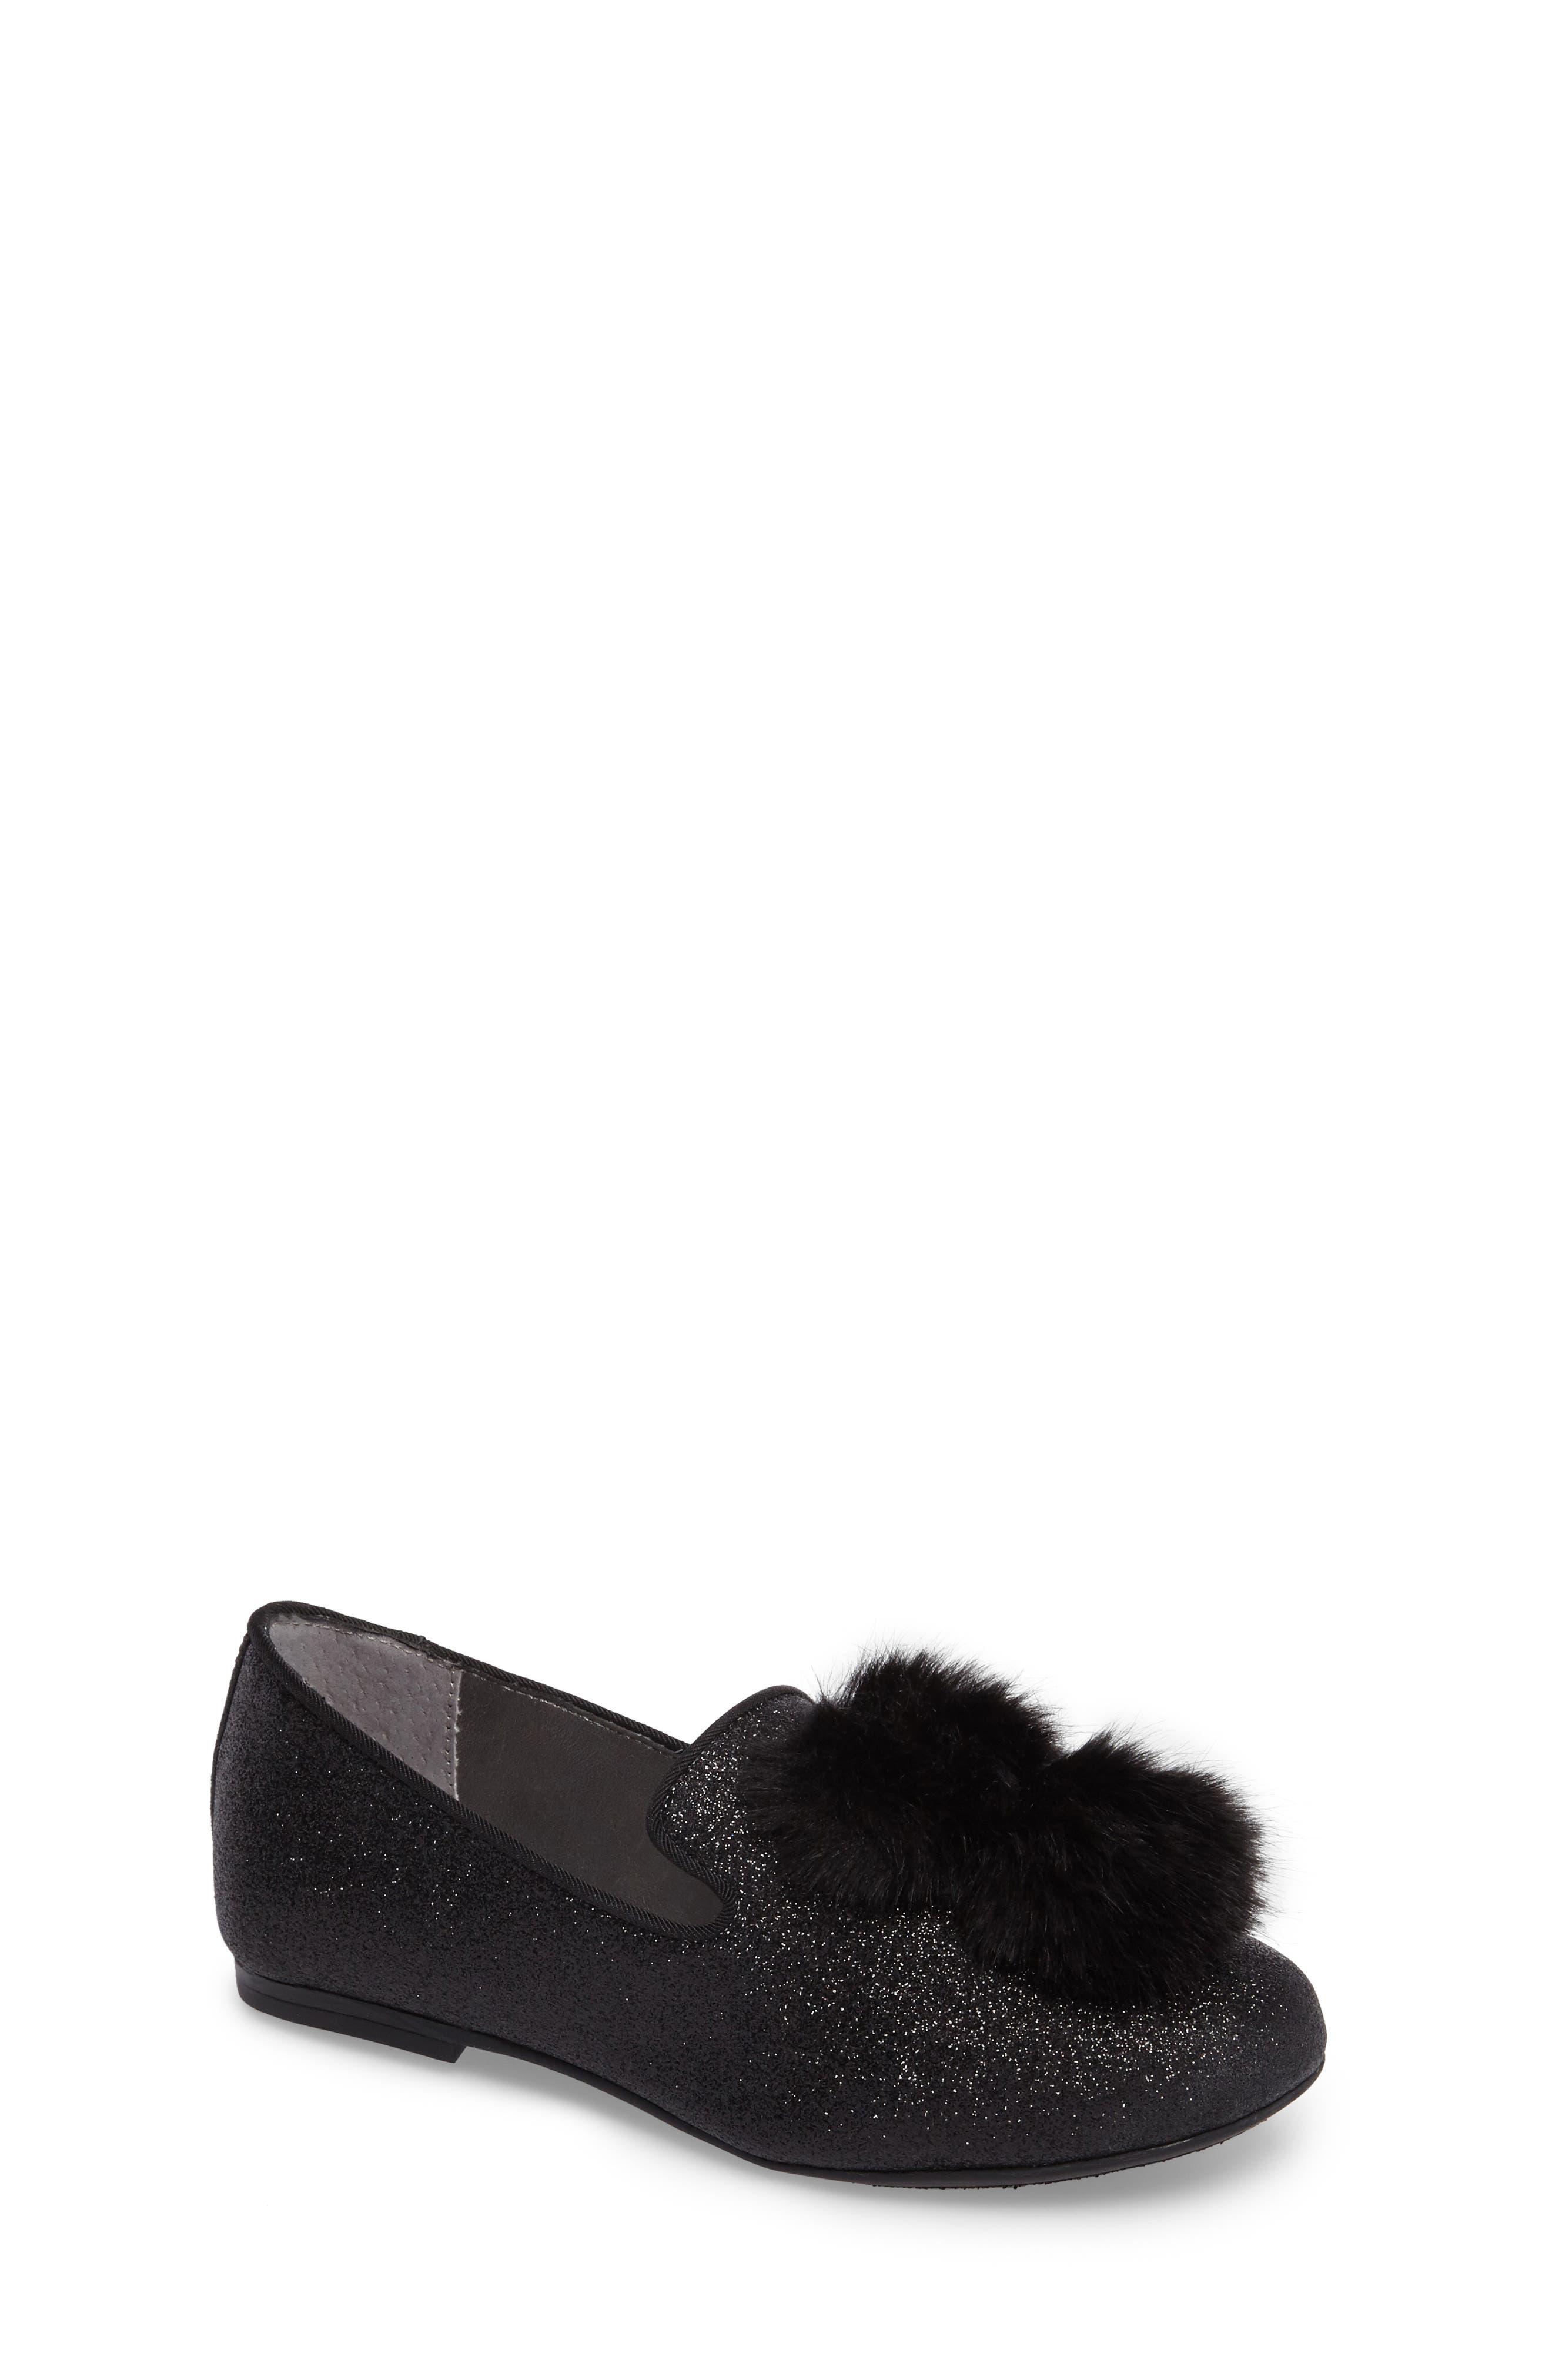 Caela Faux Fur Loafer,                         Main,                         color, 001